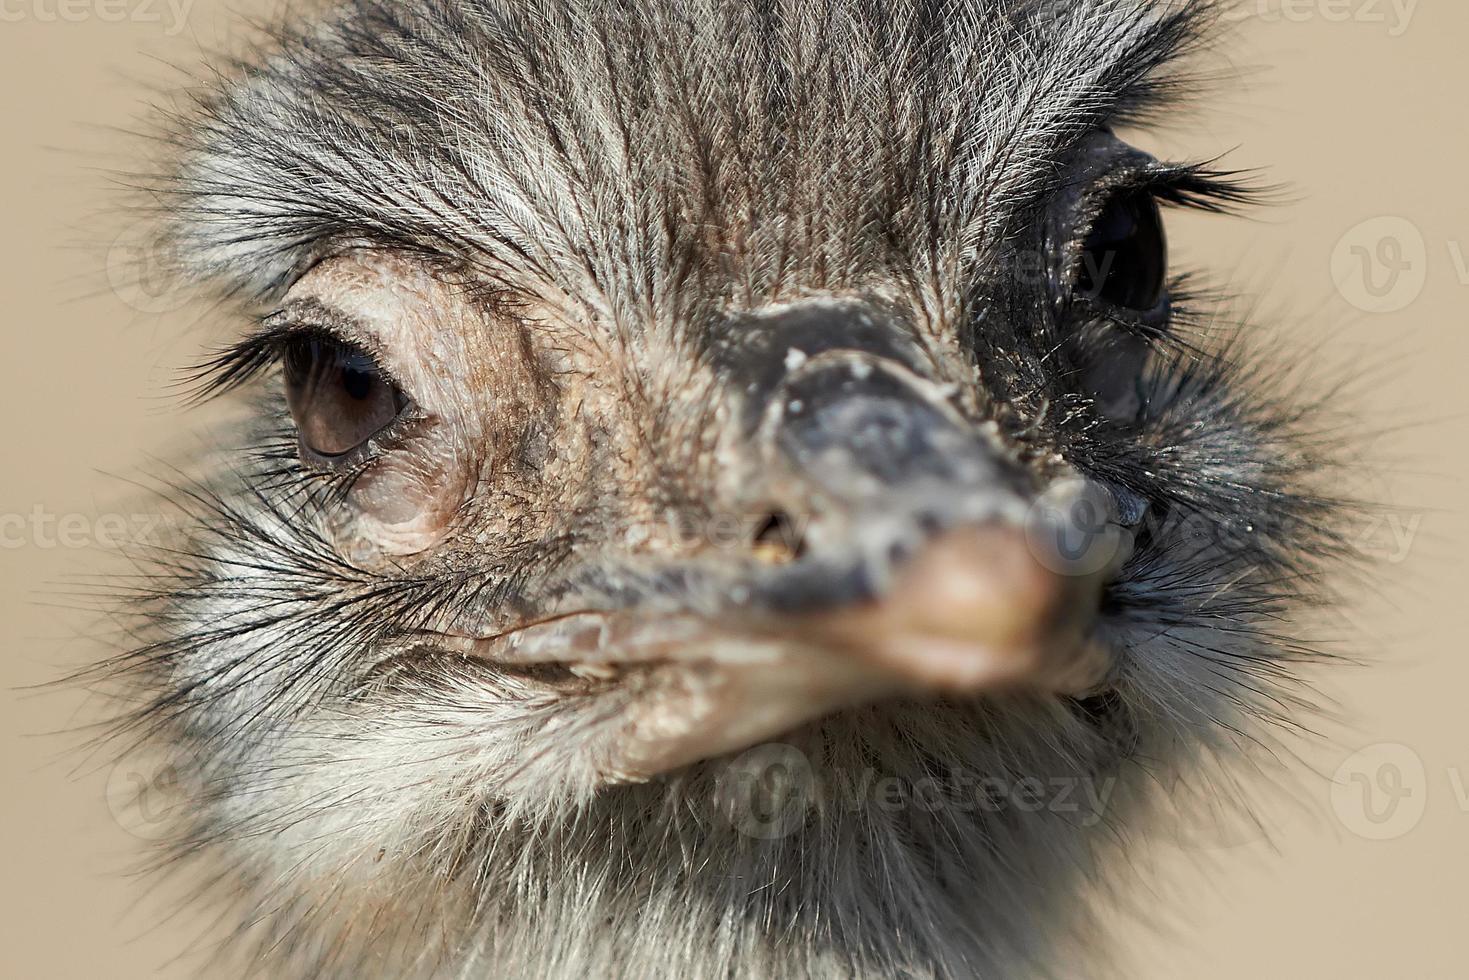 avestruz común (struthio camelus) foto